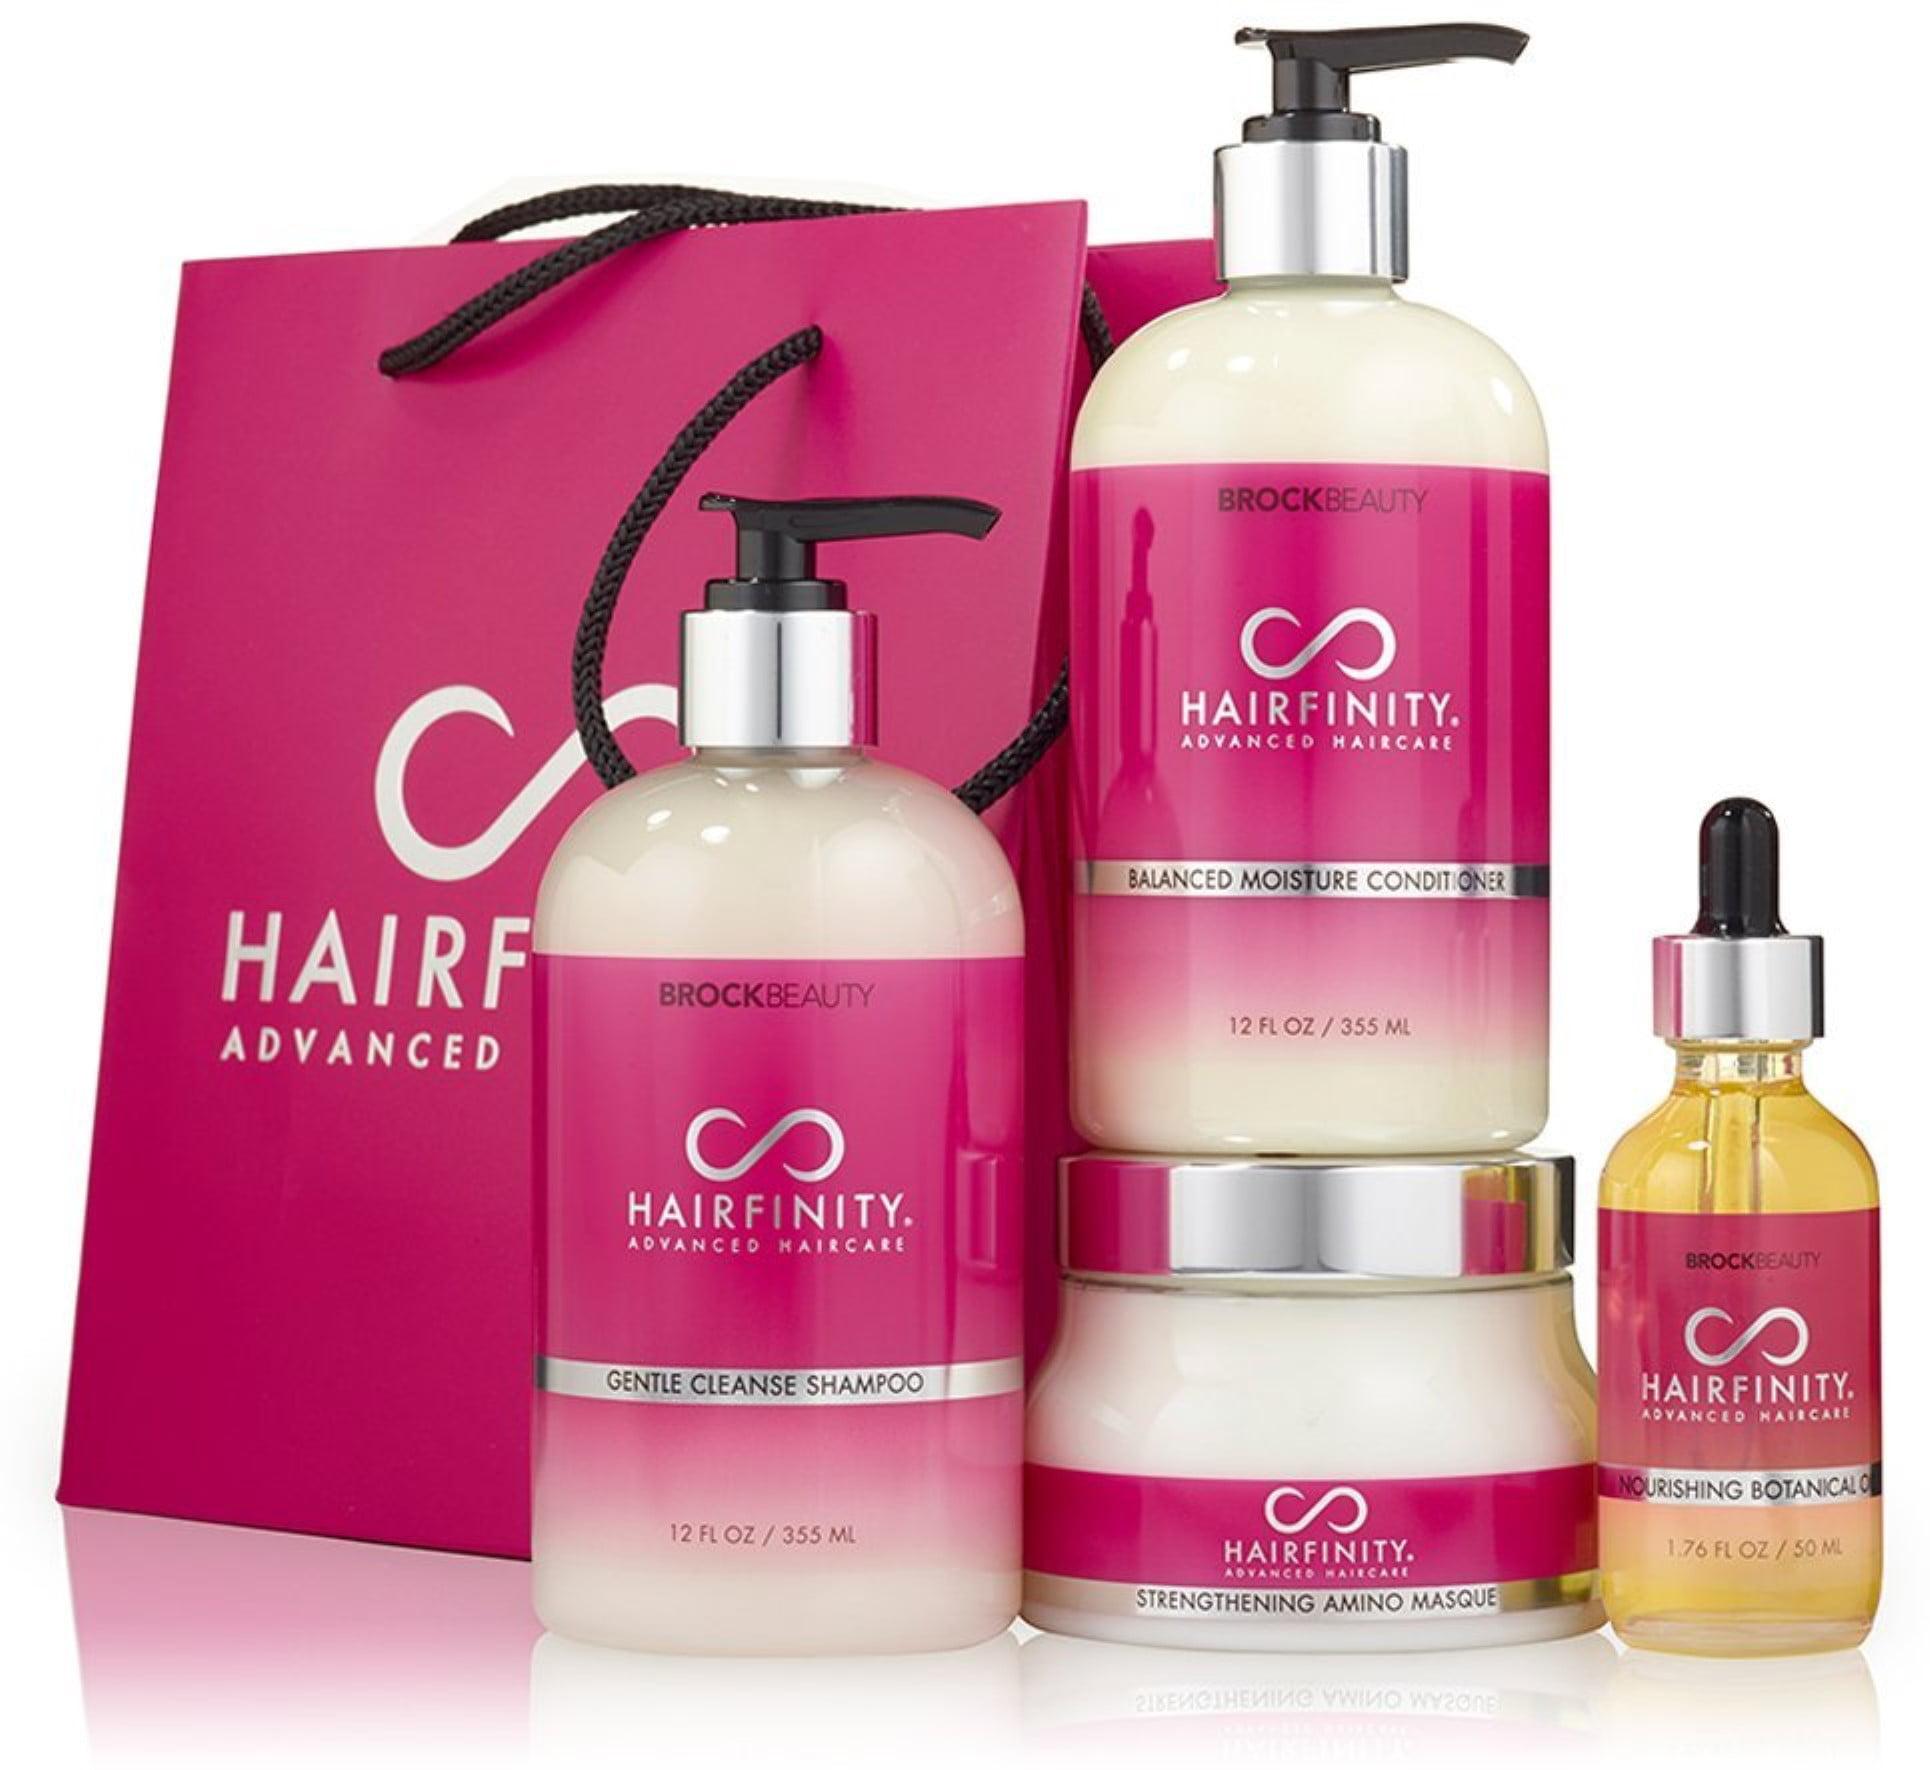 Hairfinity Ultimate Revival Kit 1 Ea